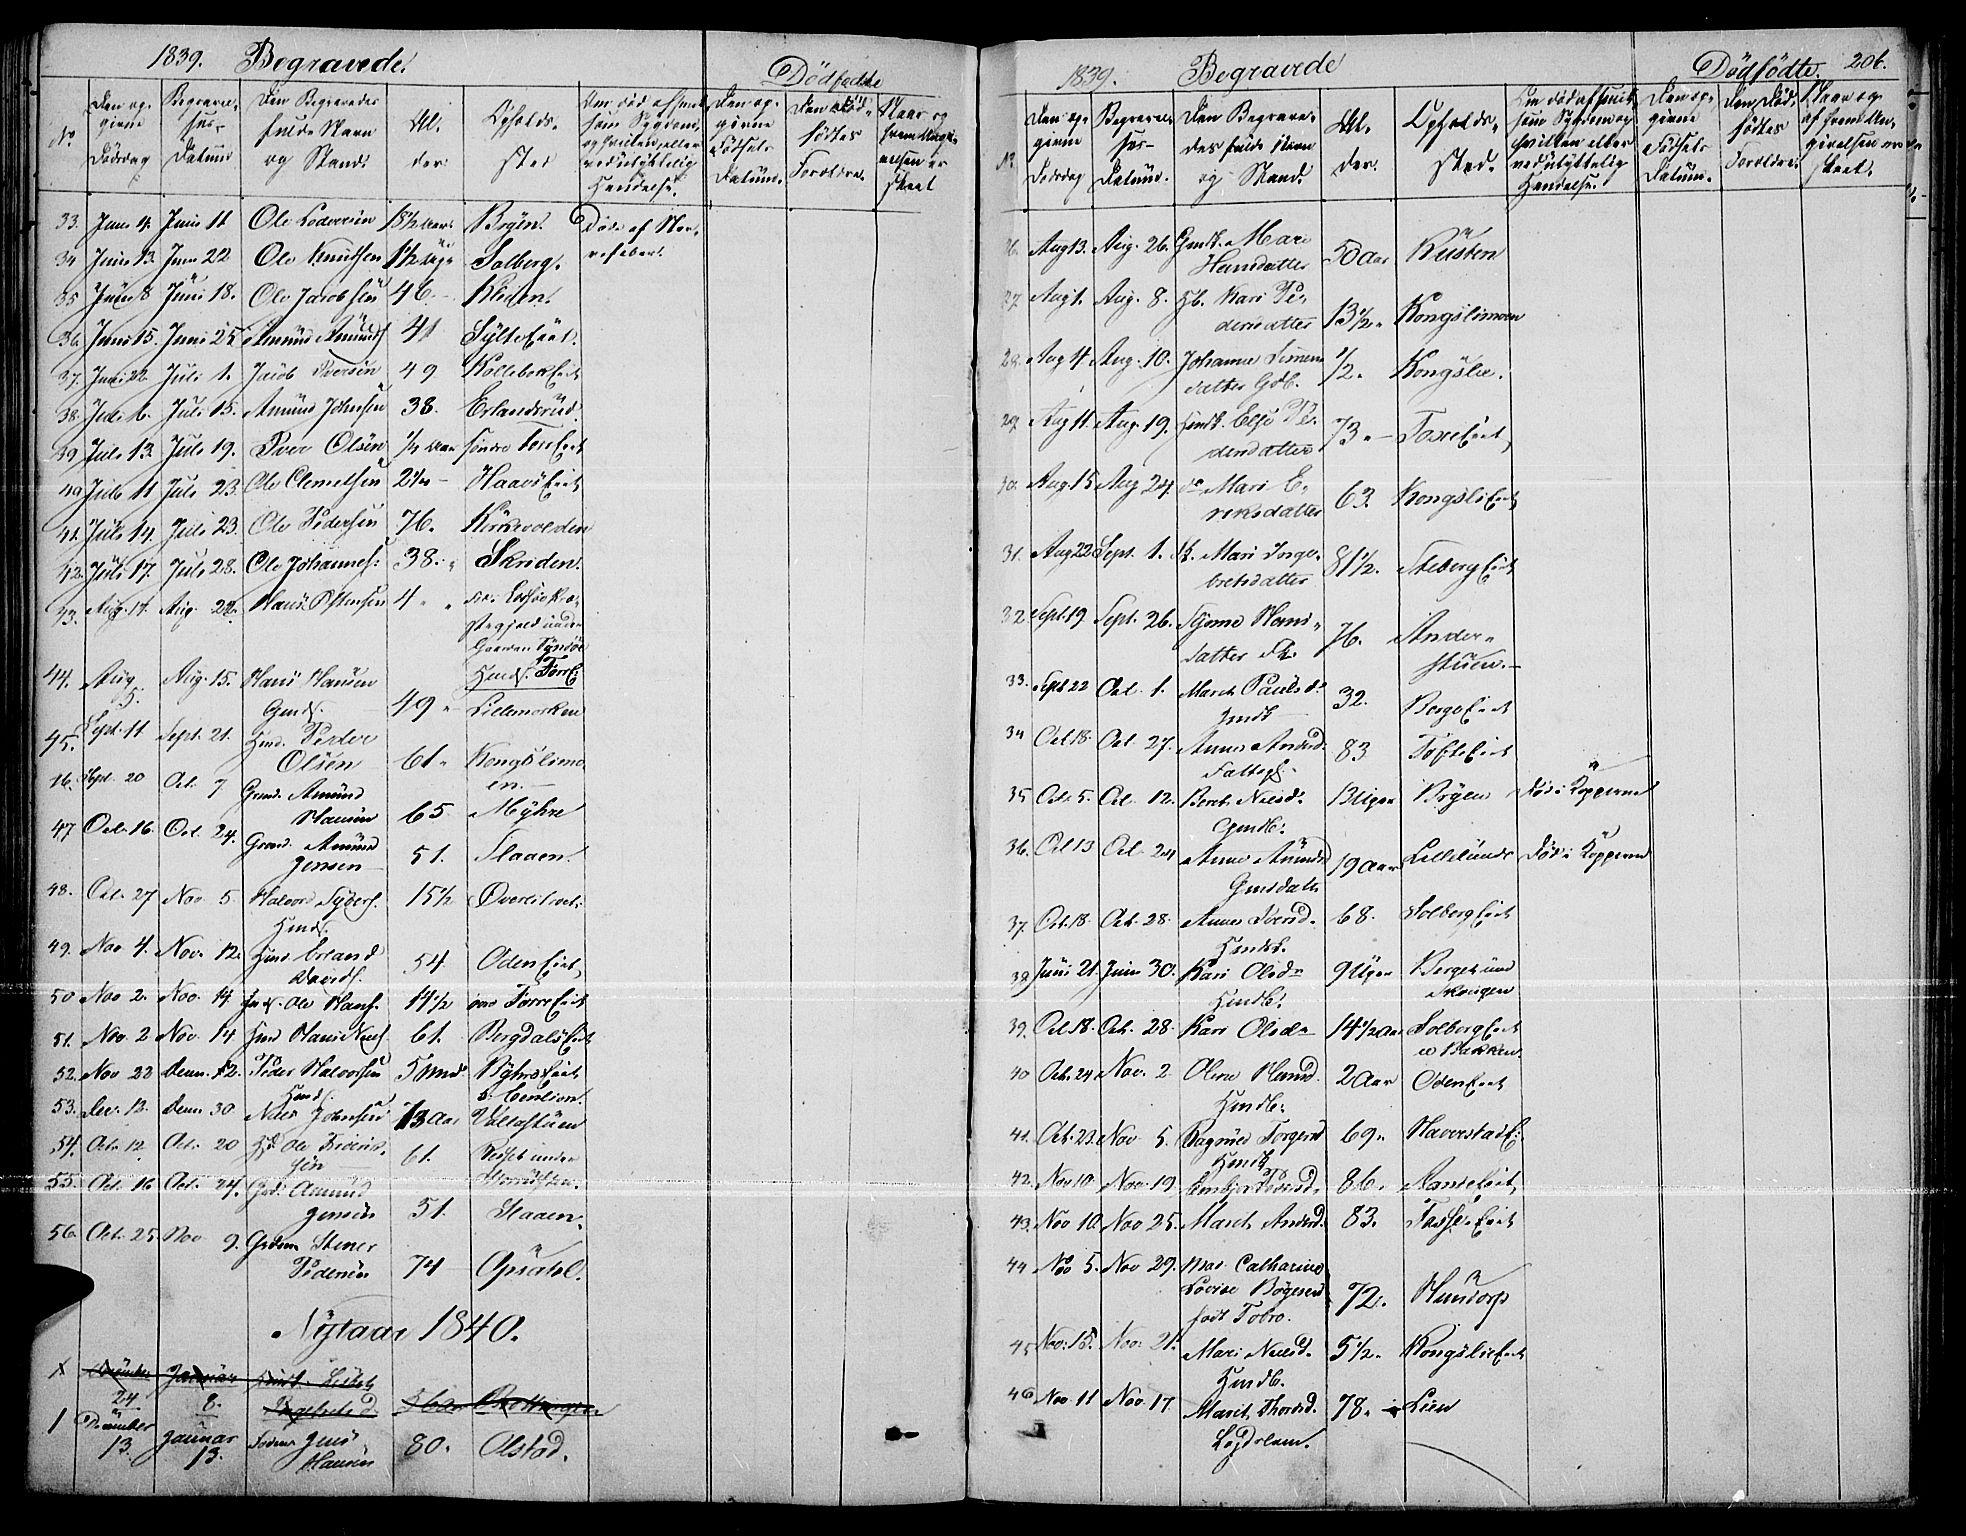 SAH, Fron prestekontor, H/Ha/Haa/L0004: Ministerialbok nr. 4, 1839-1848, s. 206